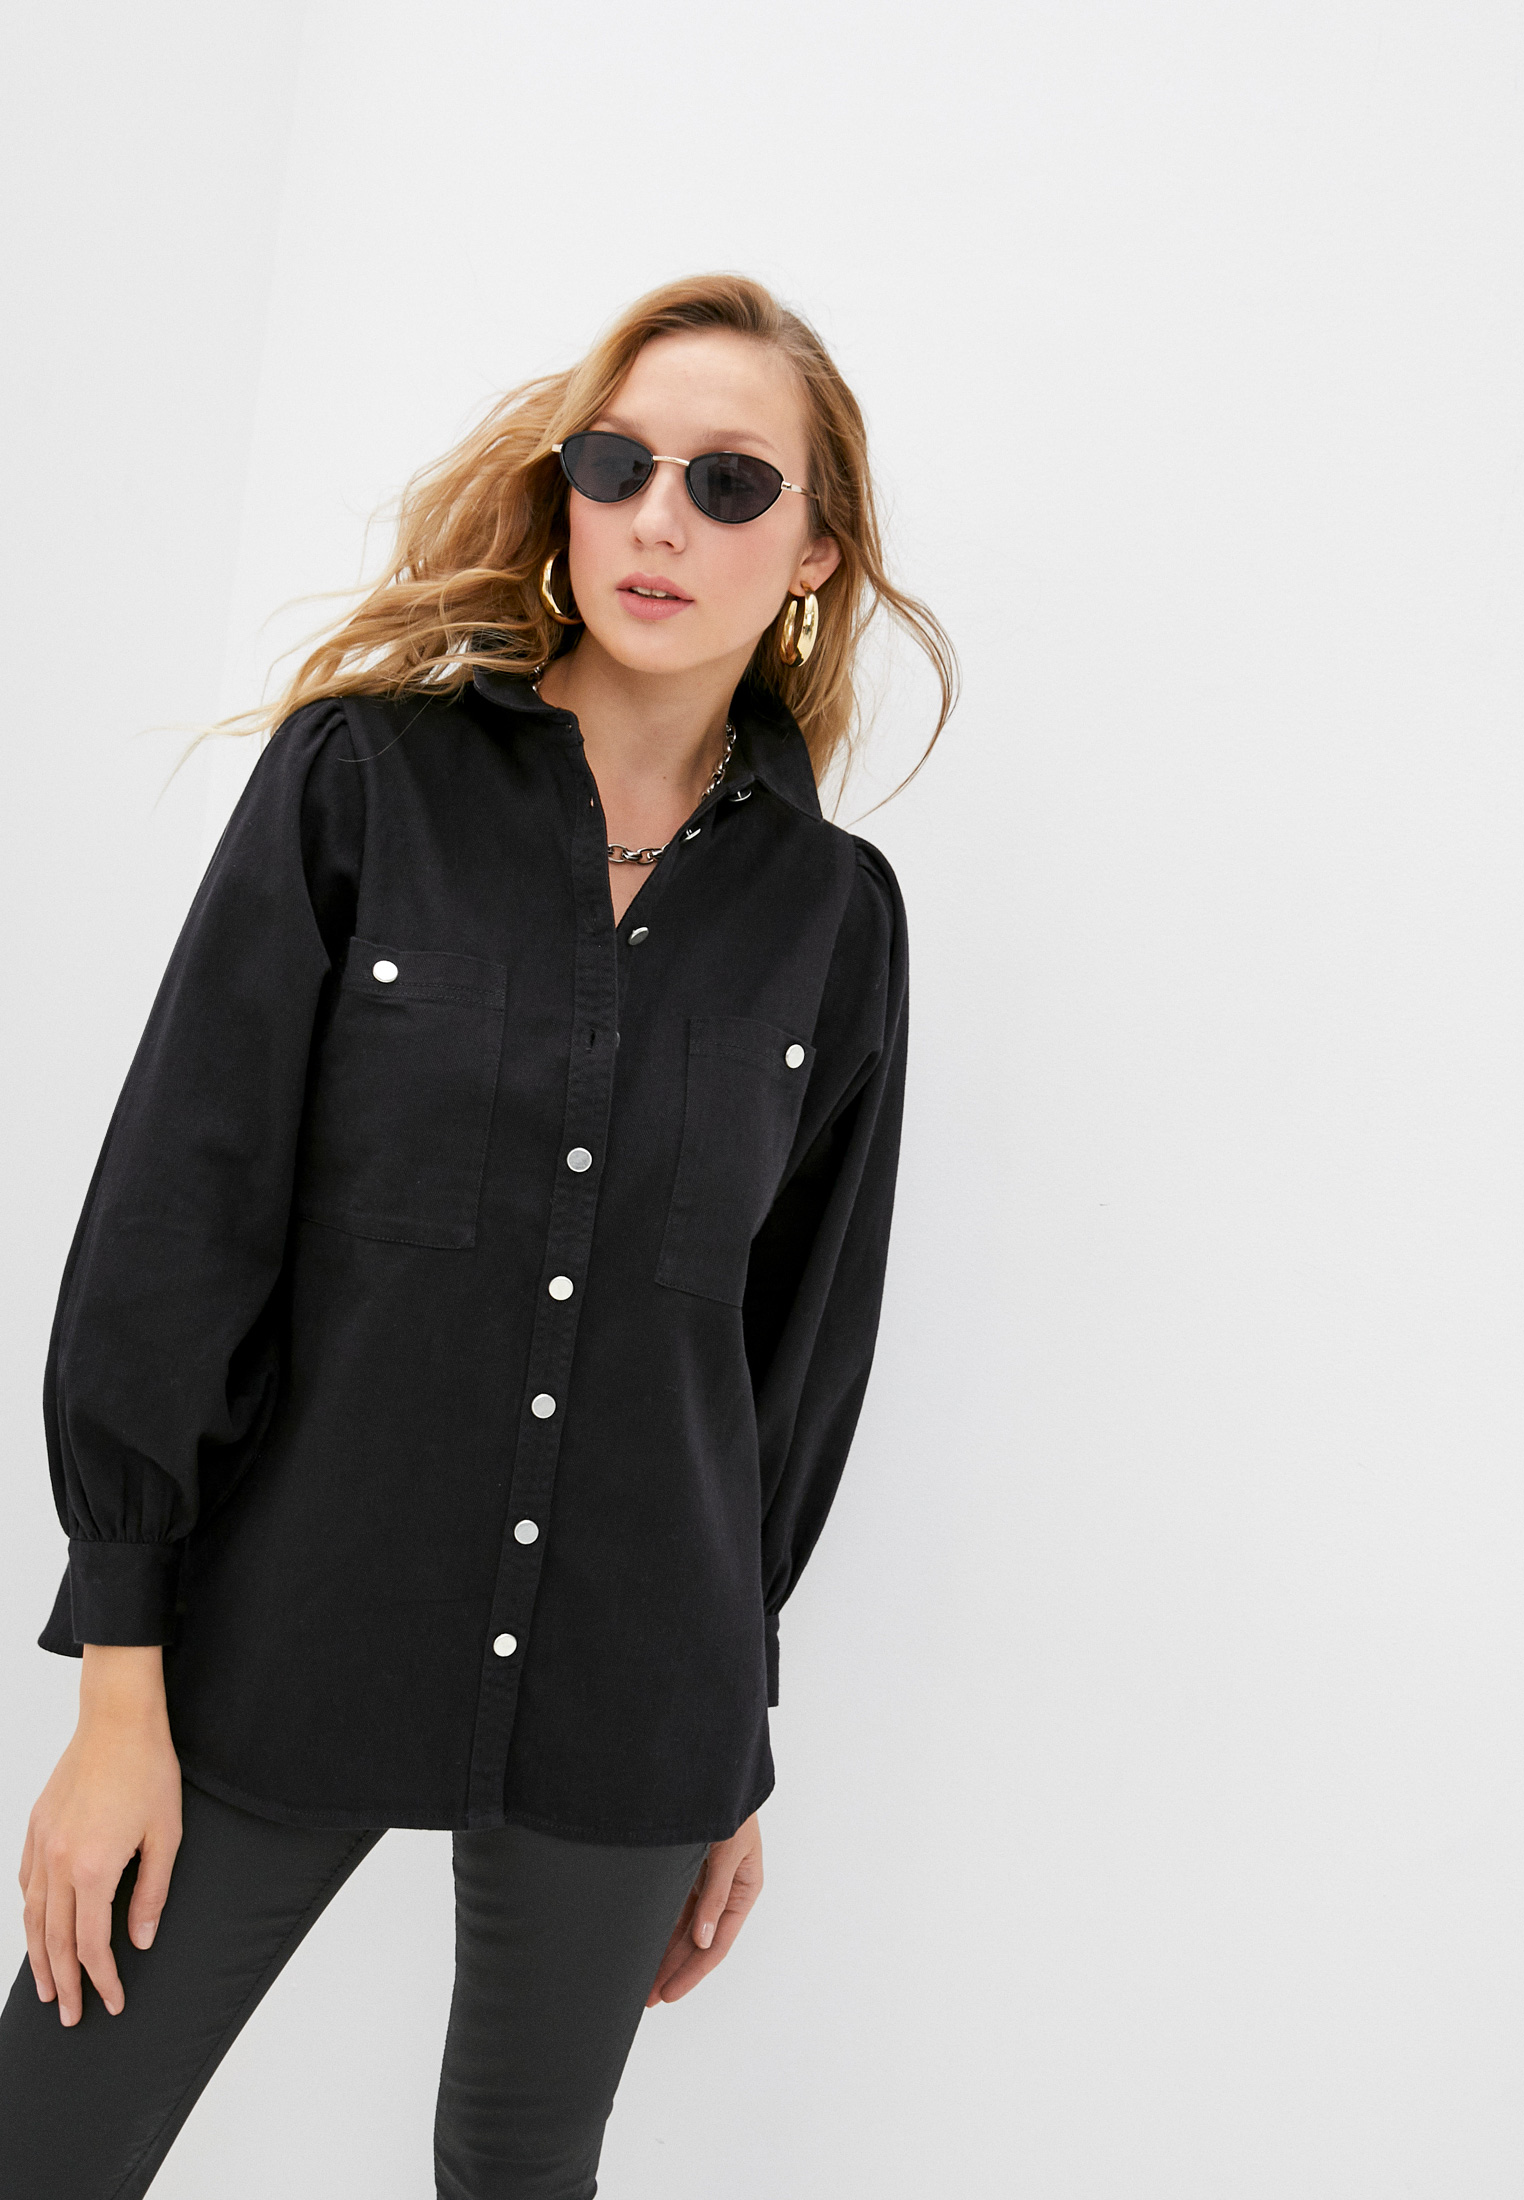 Рубашка Topshop (Топ Шоп) Рубашка джинсовая Topshop